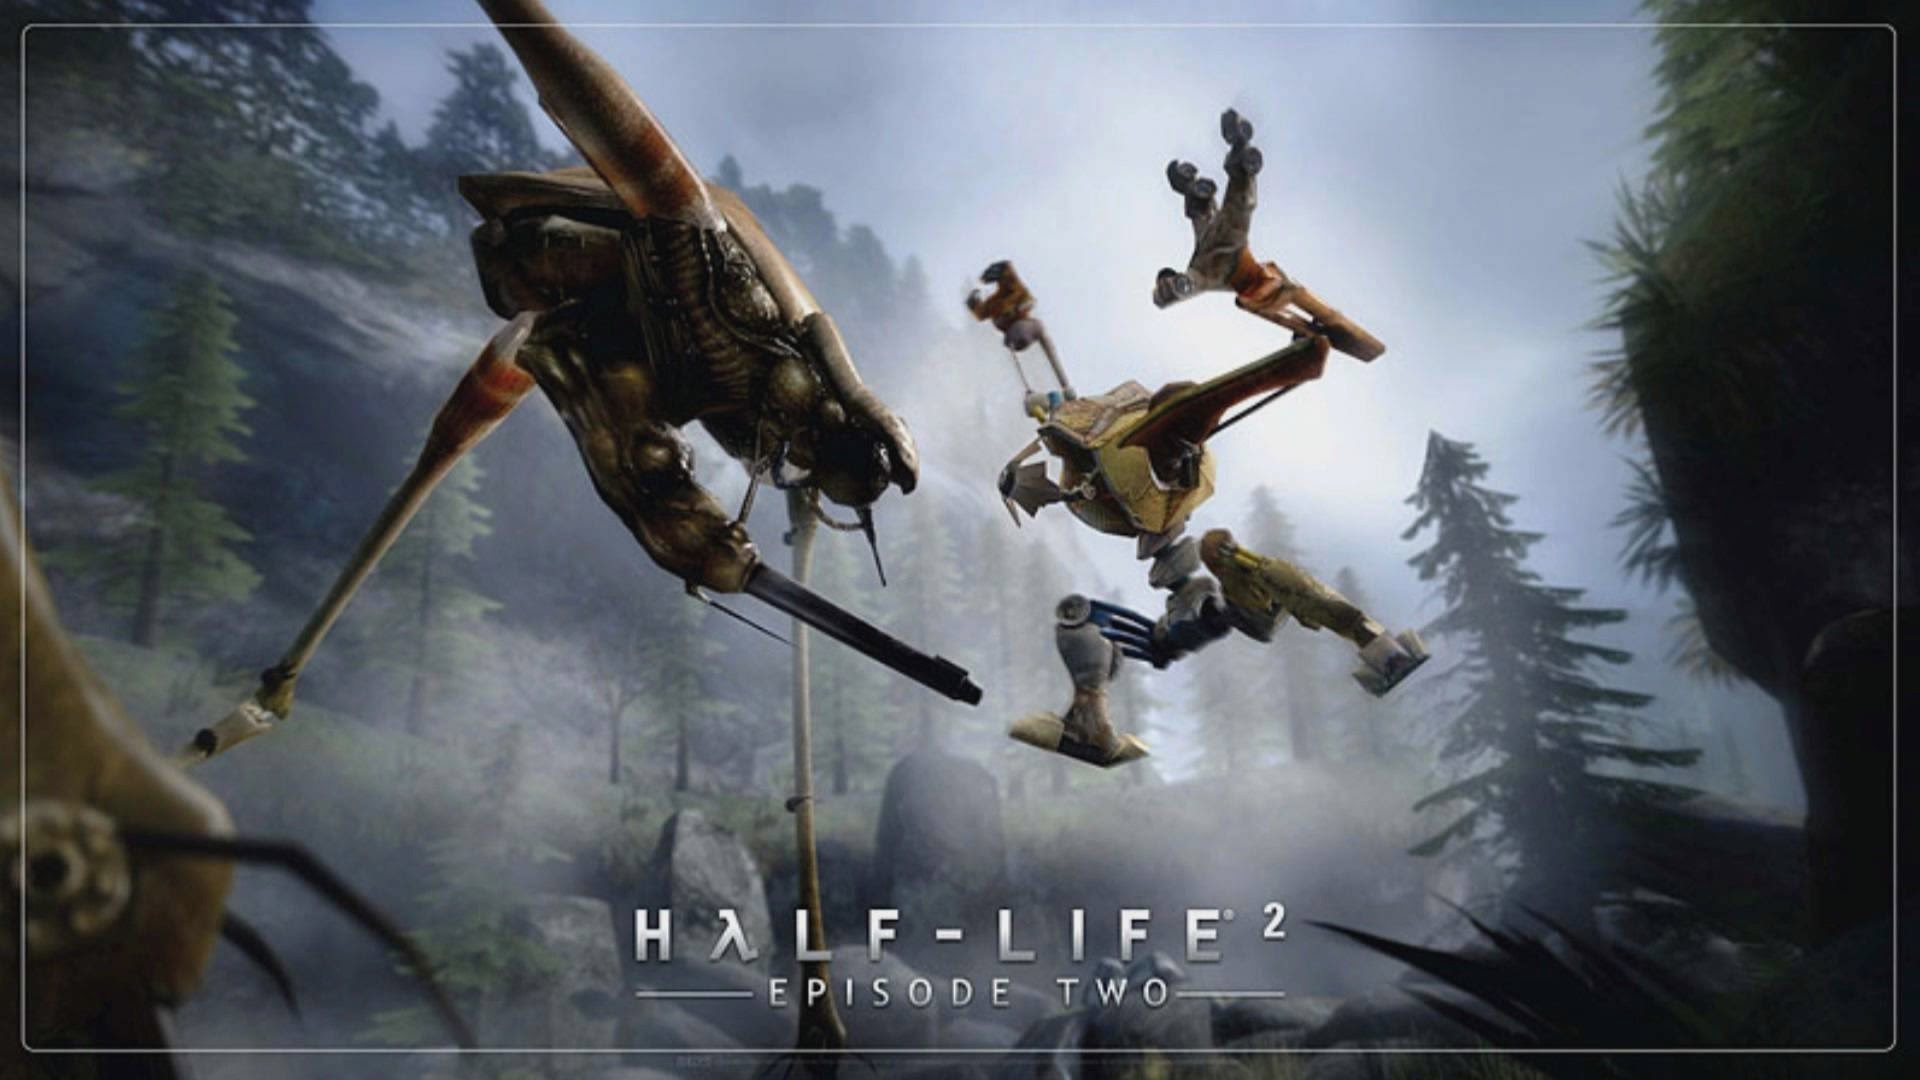 Half Life Wallpaper Desktop 61 Images